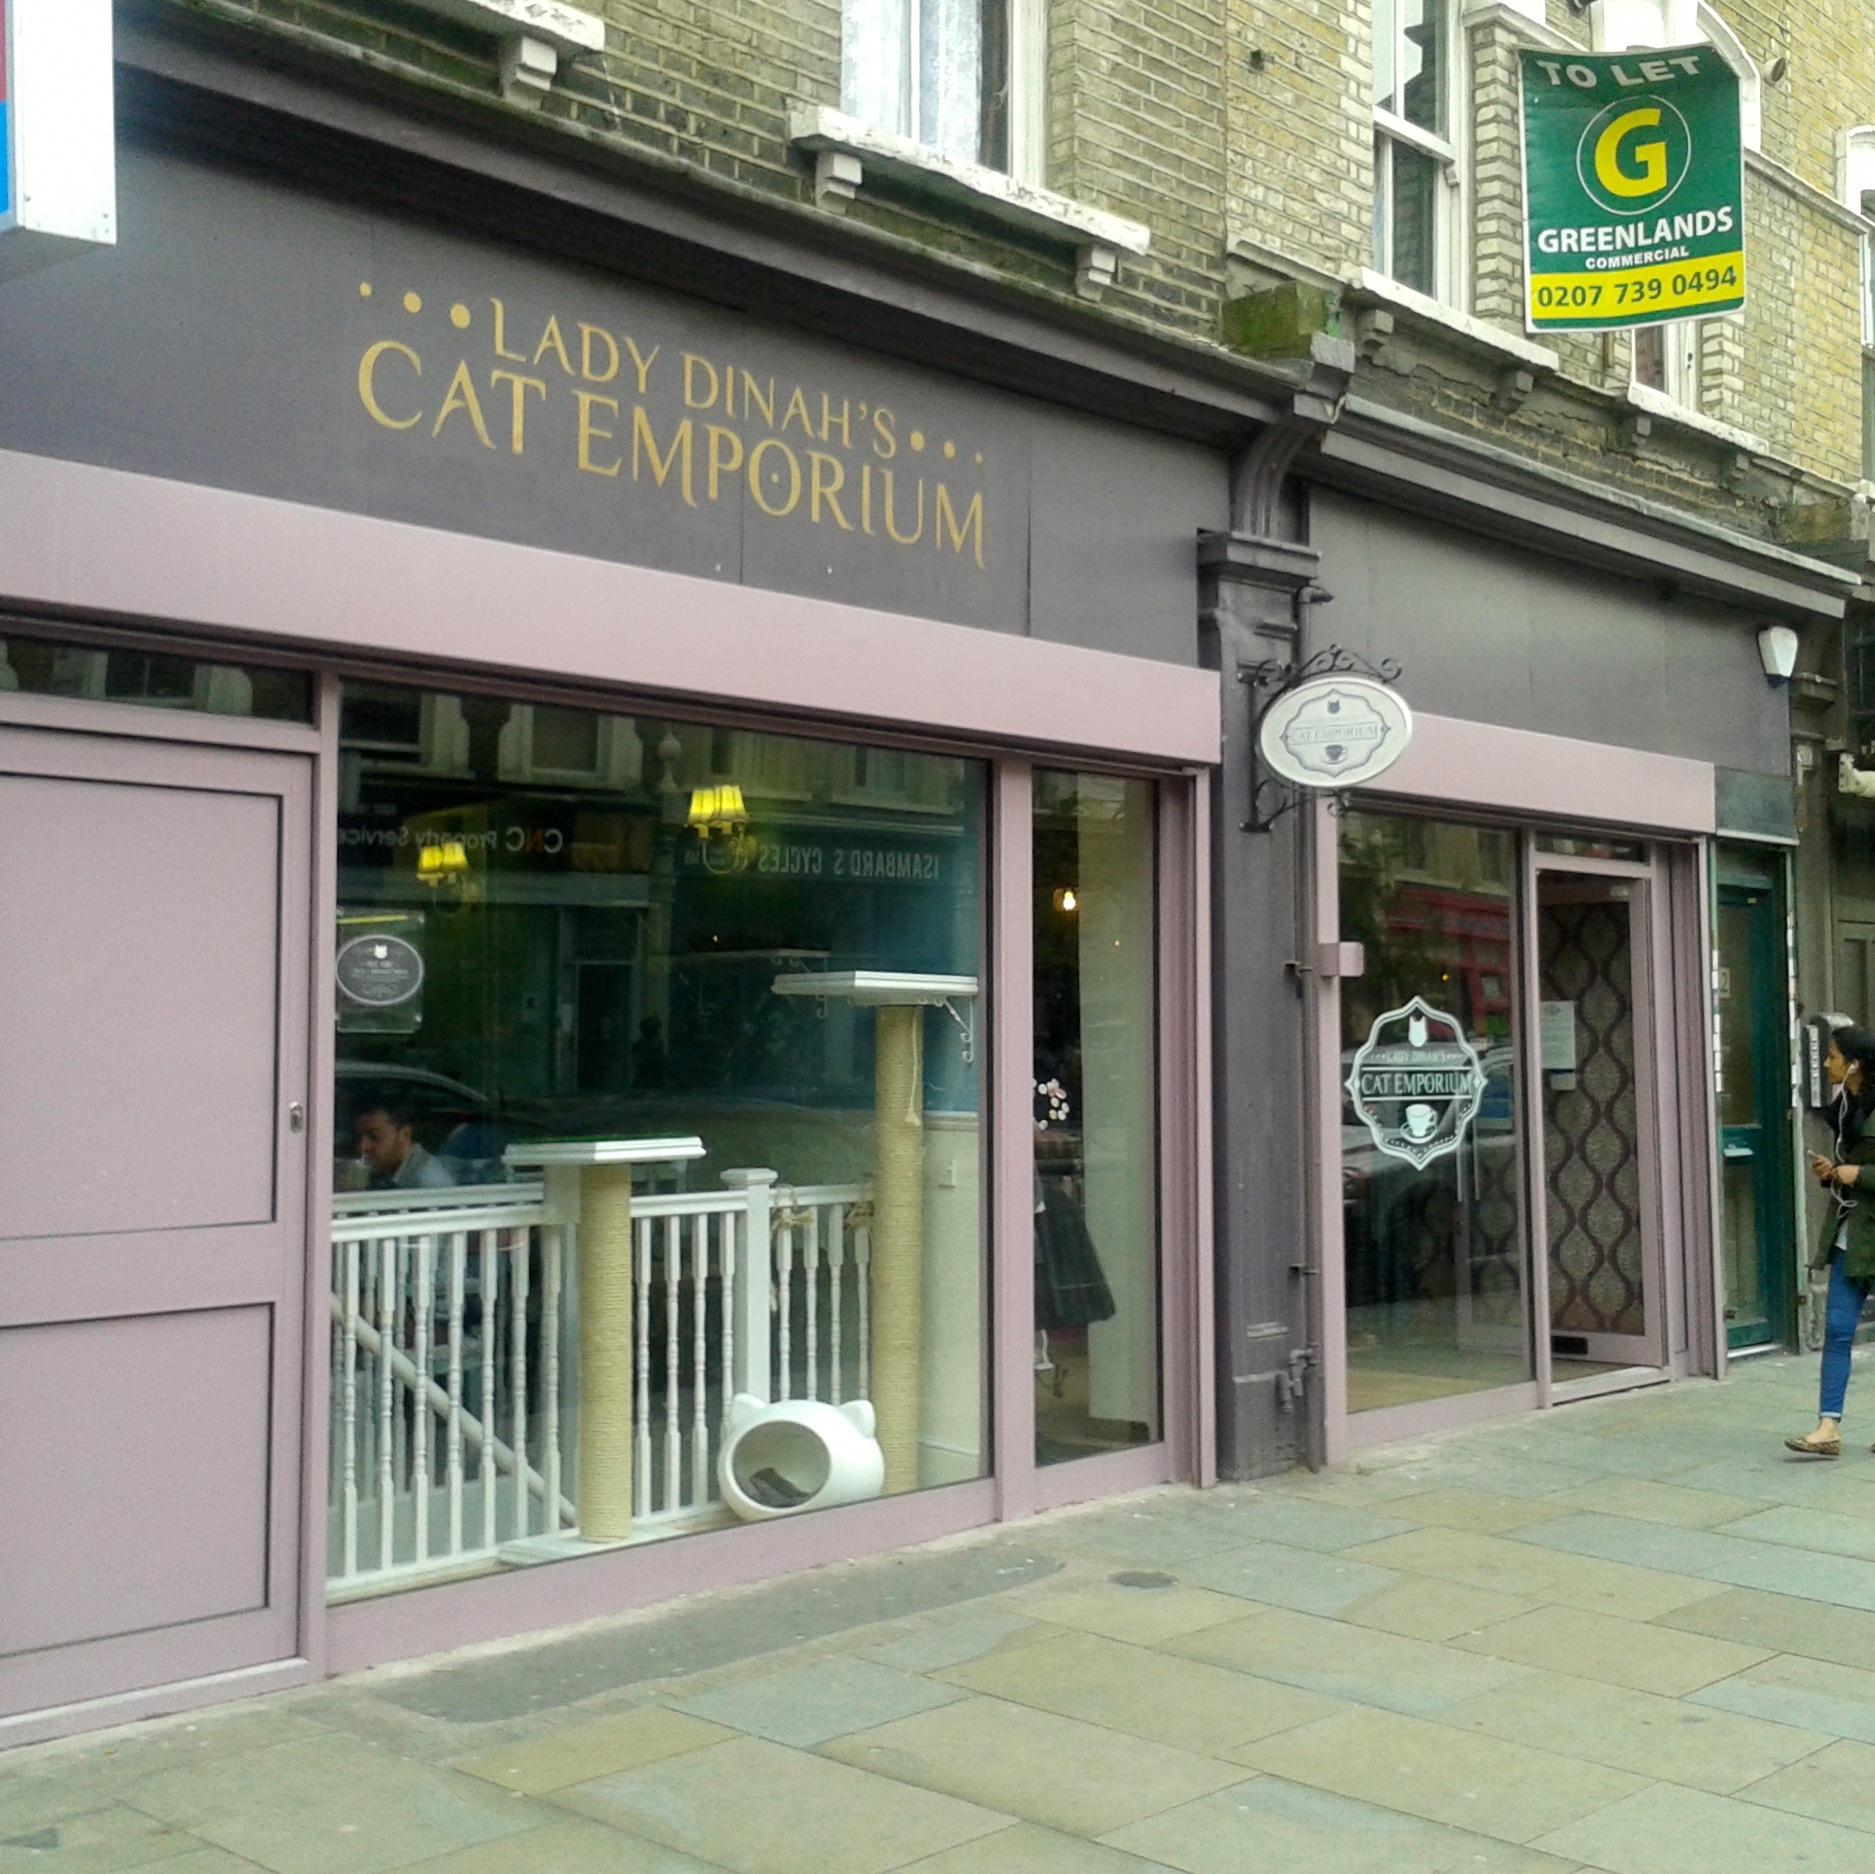 https://i0.wp.com/fatgayvegan.com/wp-content/uploads/2014/04/cat-cafe.jpg?fit=1875%2C1874